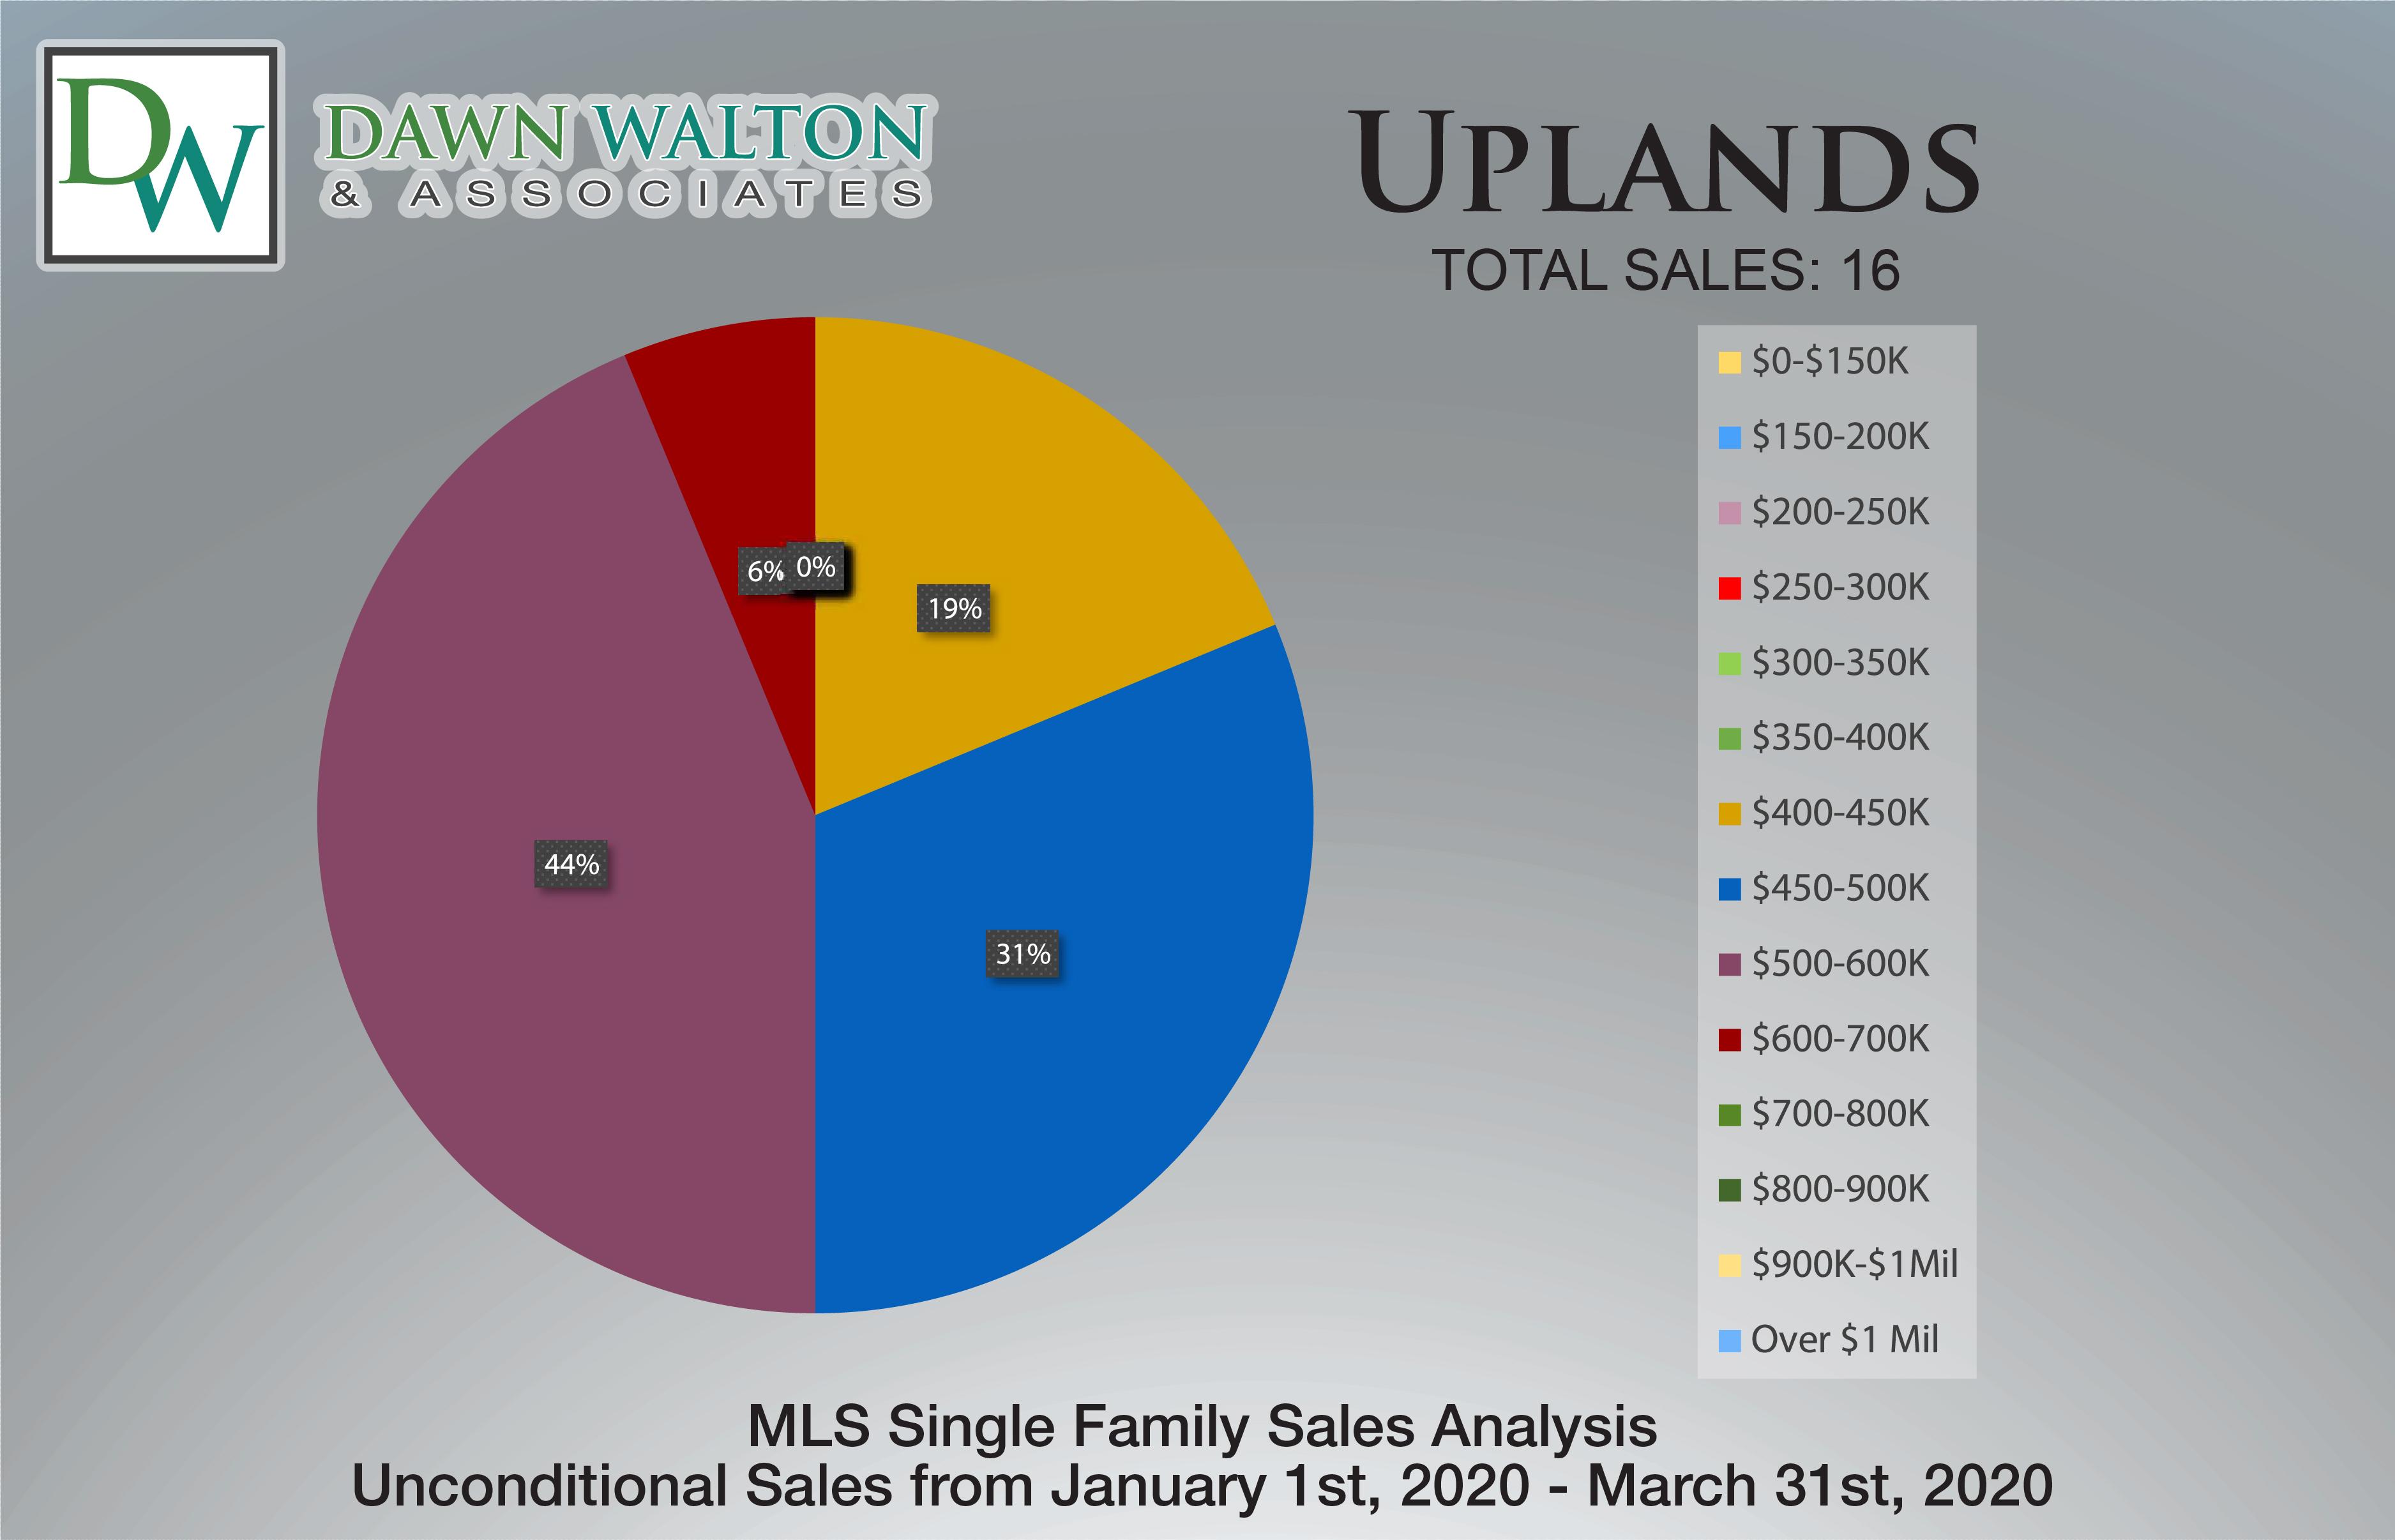 Uplands Real Estate Market Stats Price Percentage Jan 1-Mar 31 2020 - Nanaimo Realtor Dawn Walton